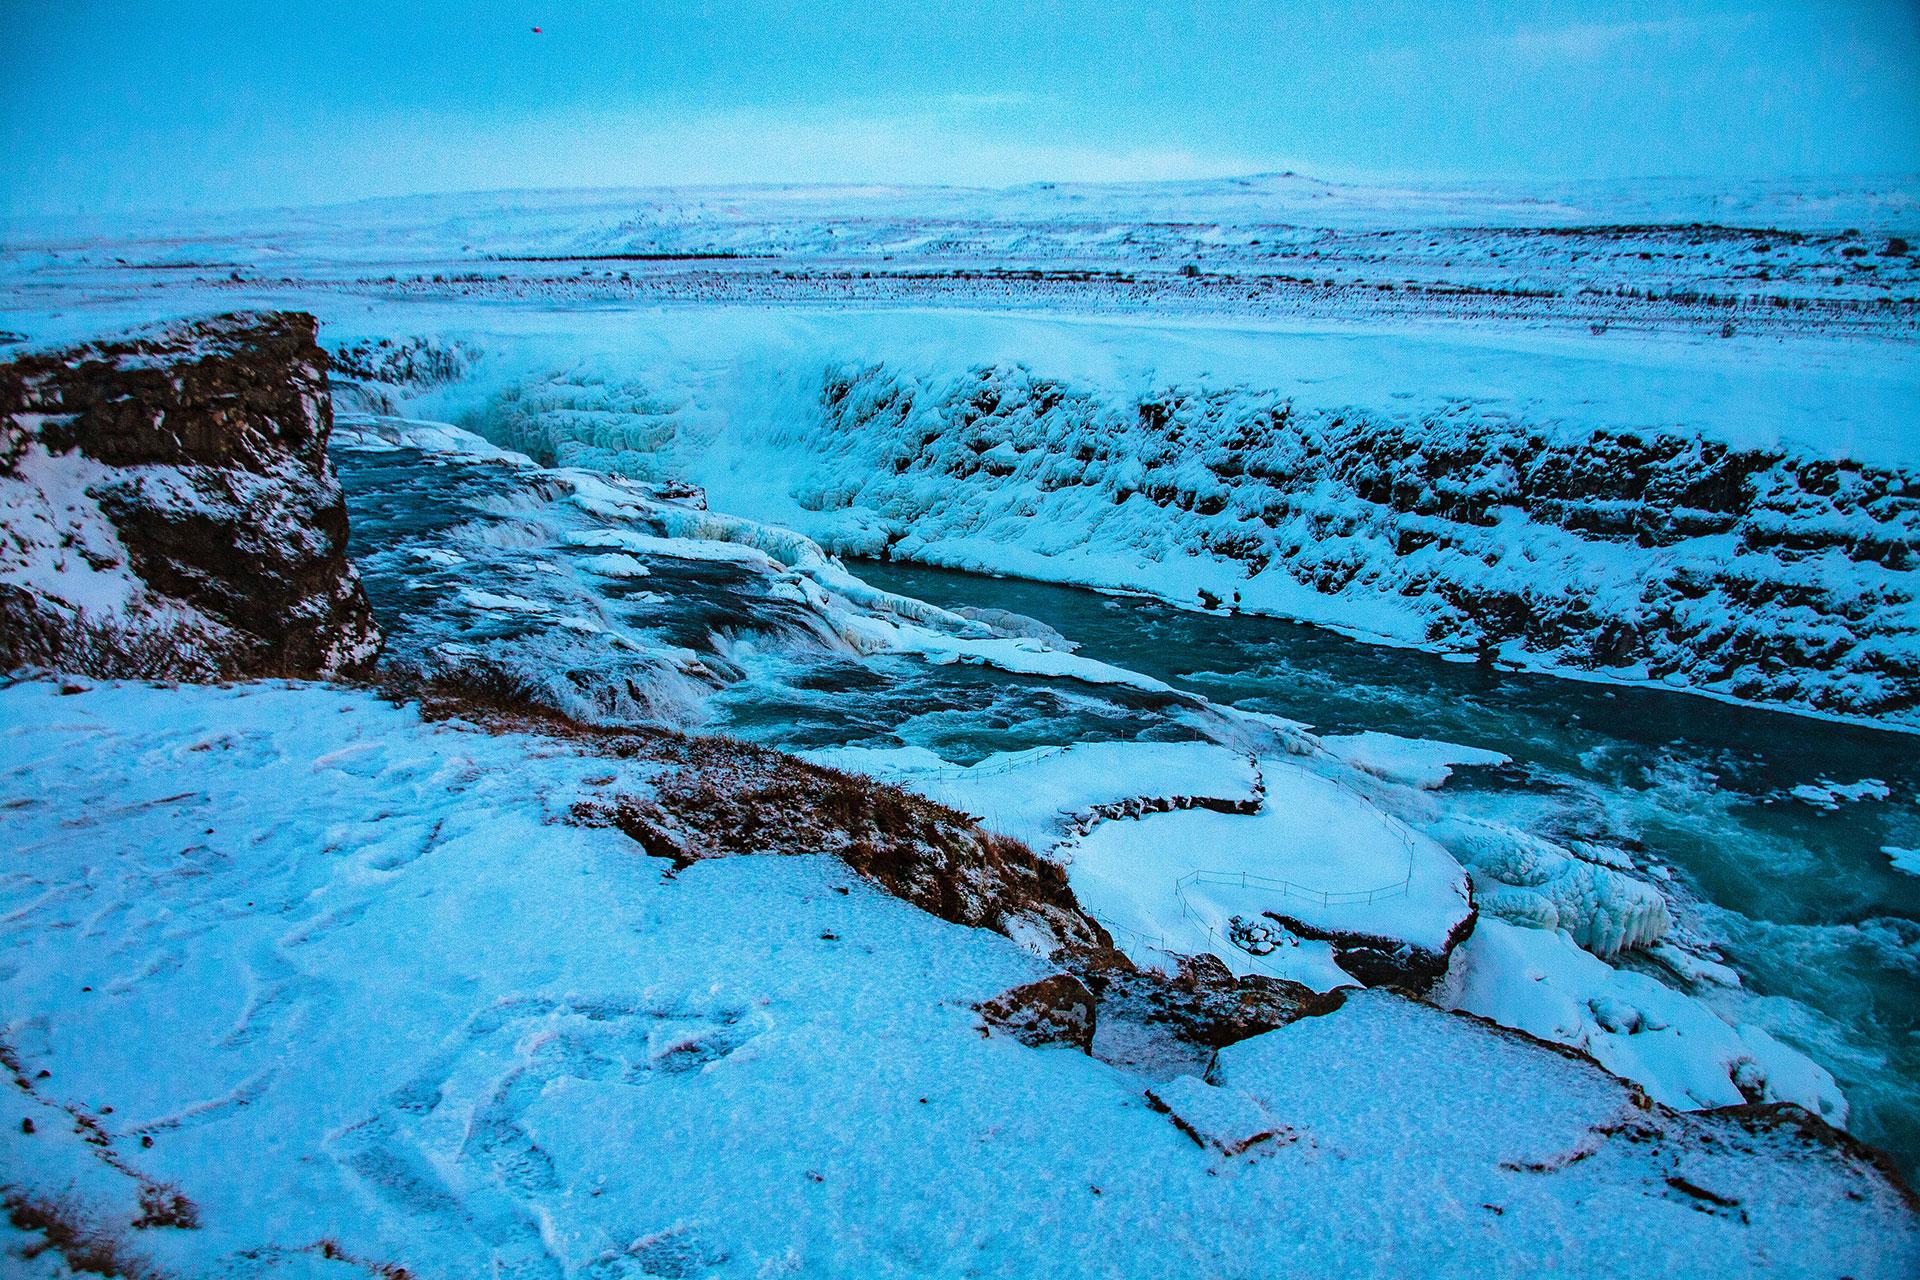 Piotr Kopaniszyn - rzut oka na Islandię